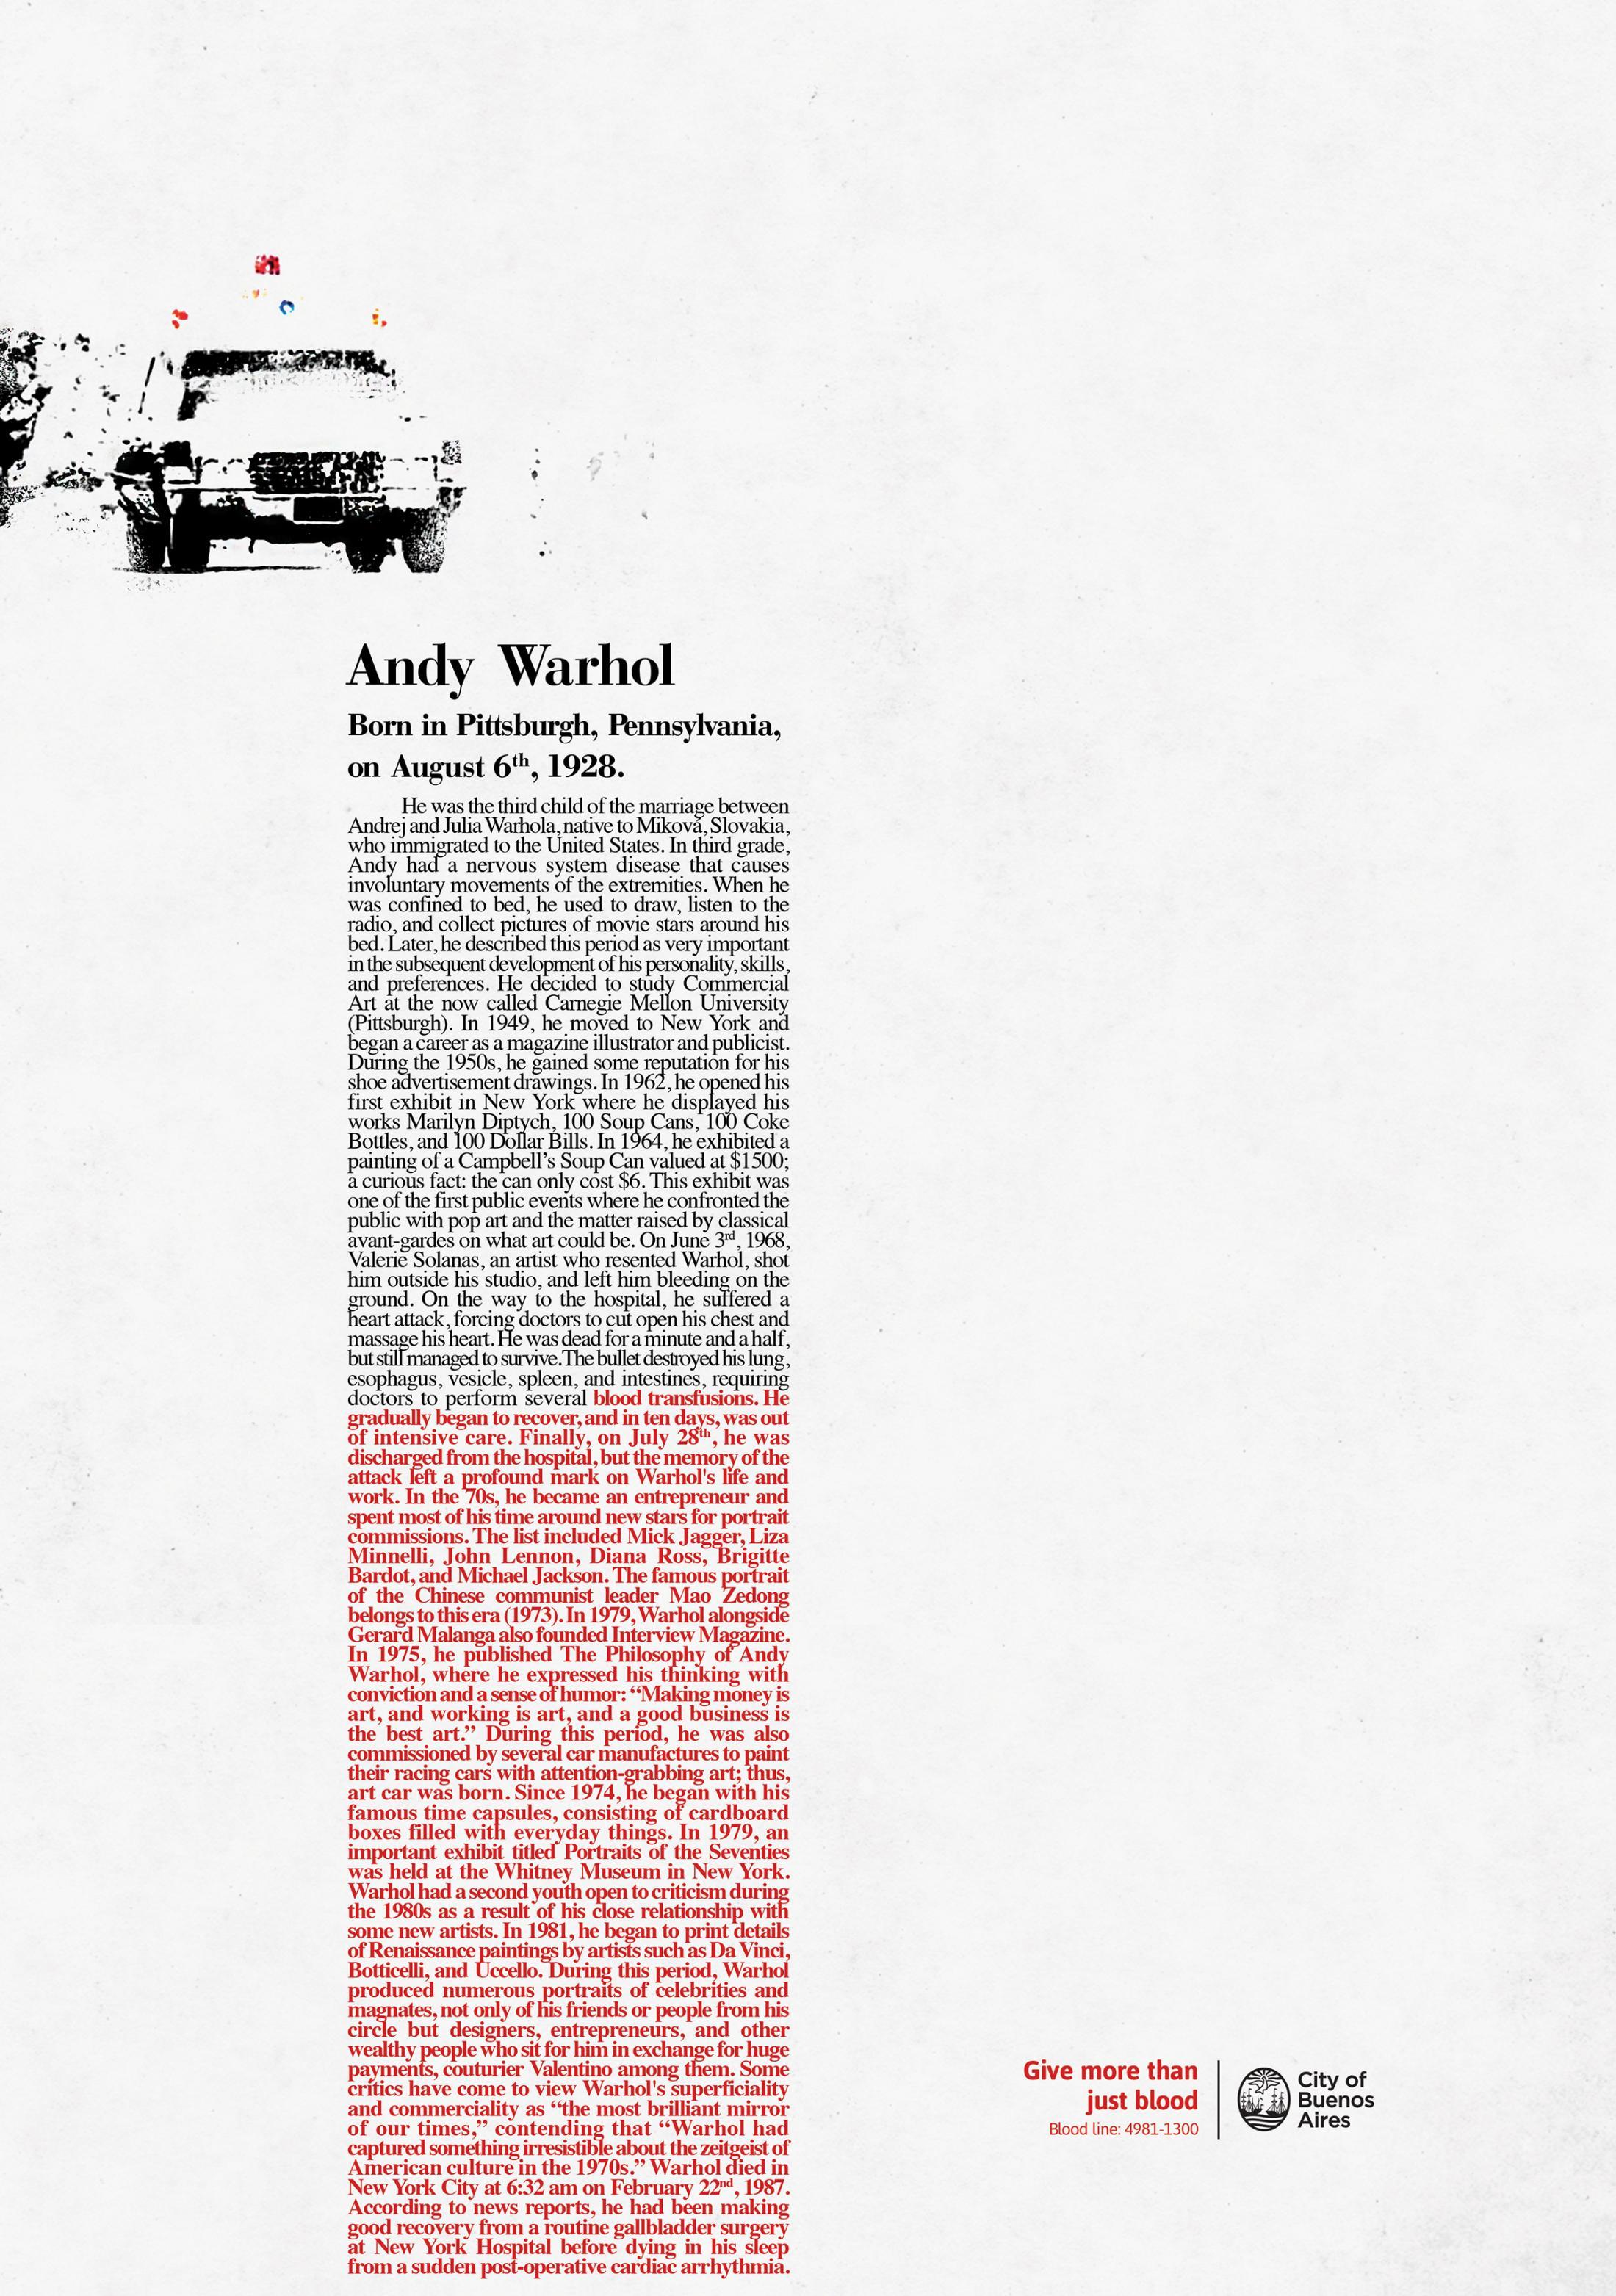 Thumbnail for Andy Warhol